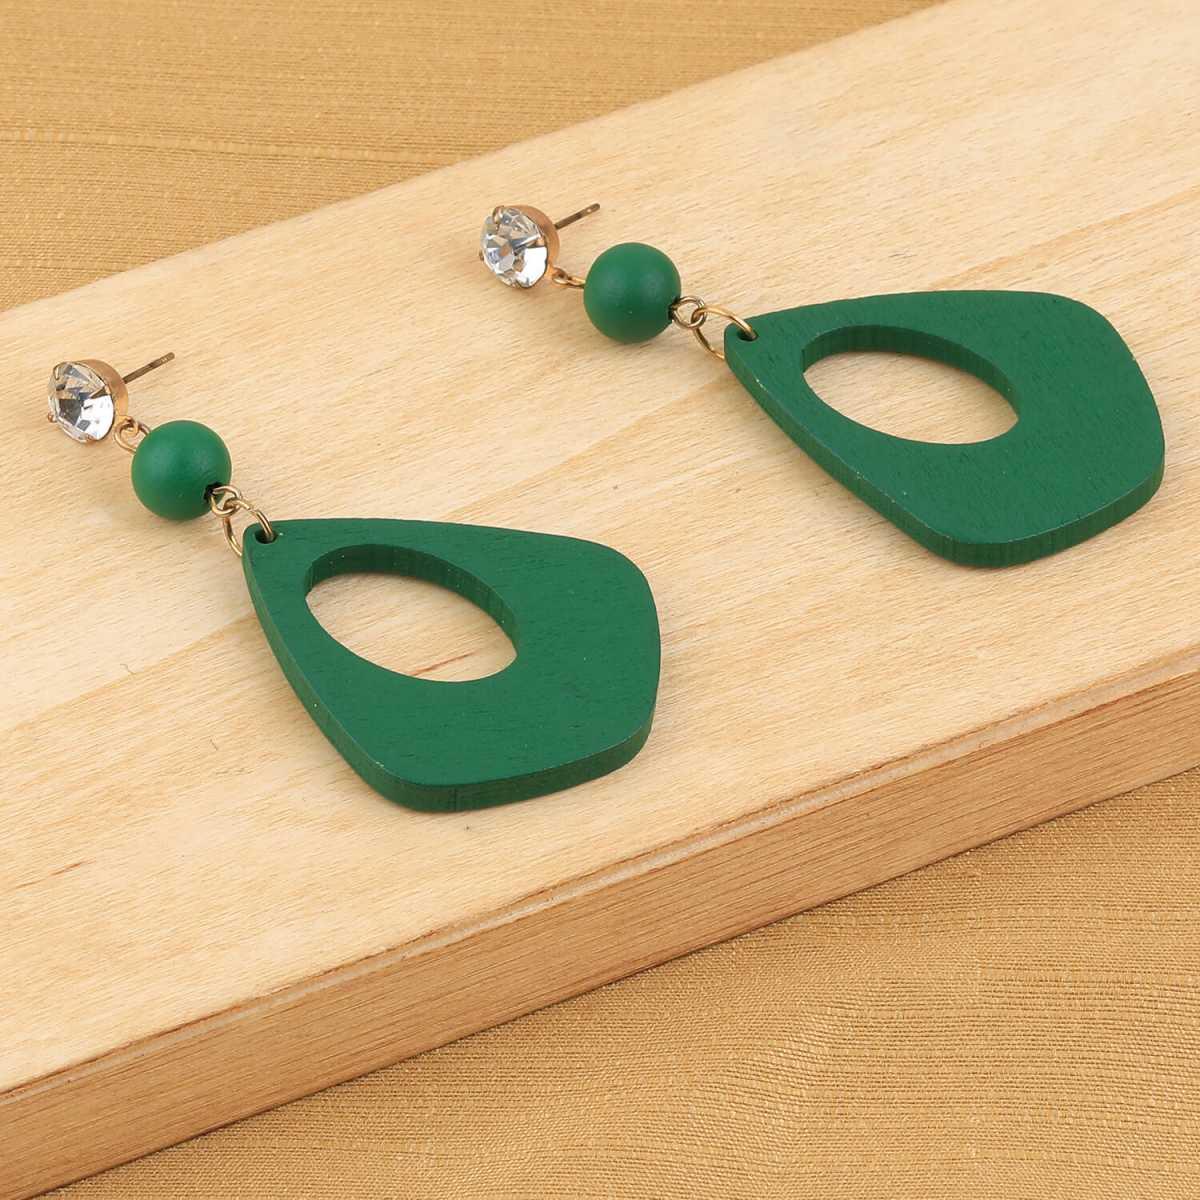 SILVER SHINE Ethnic Drop Diamond Gren Wooden Light Weight Earrings for Girls and Women.